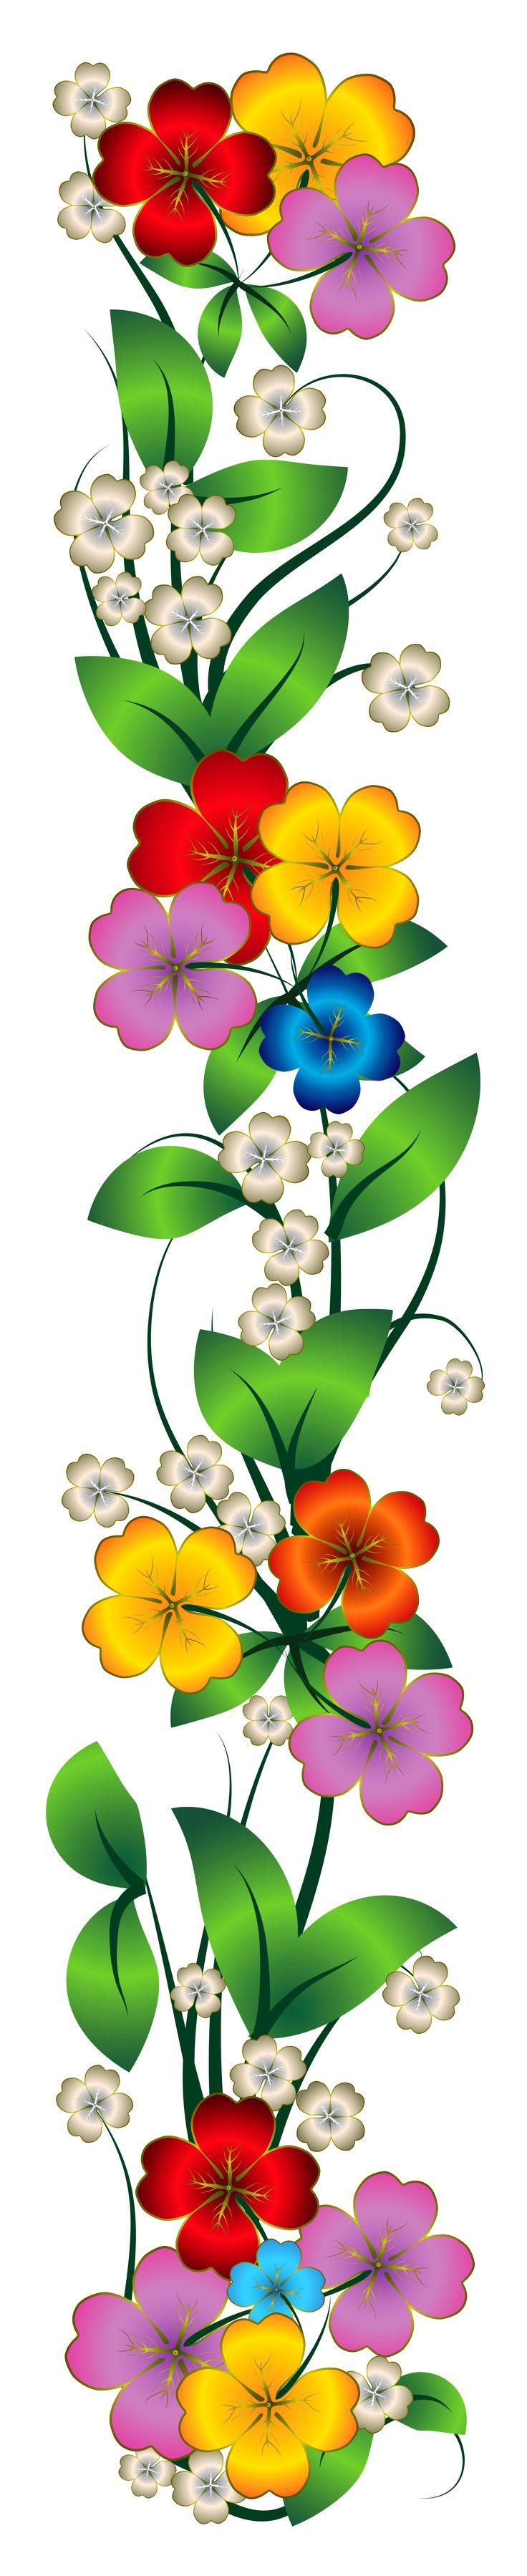 Flowers Decor PNG Clipart